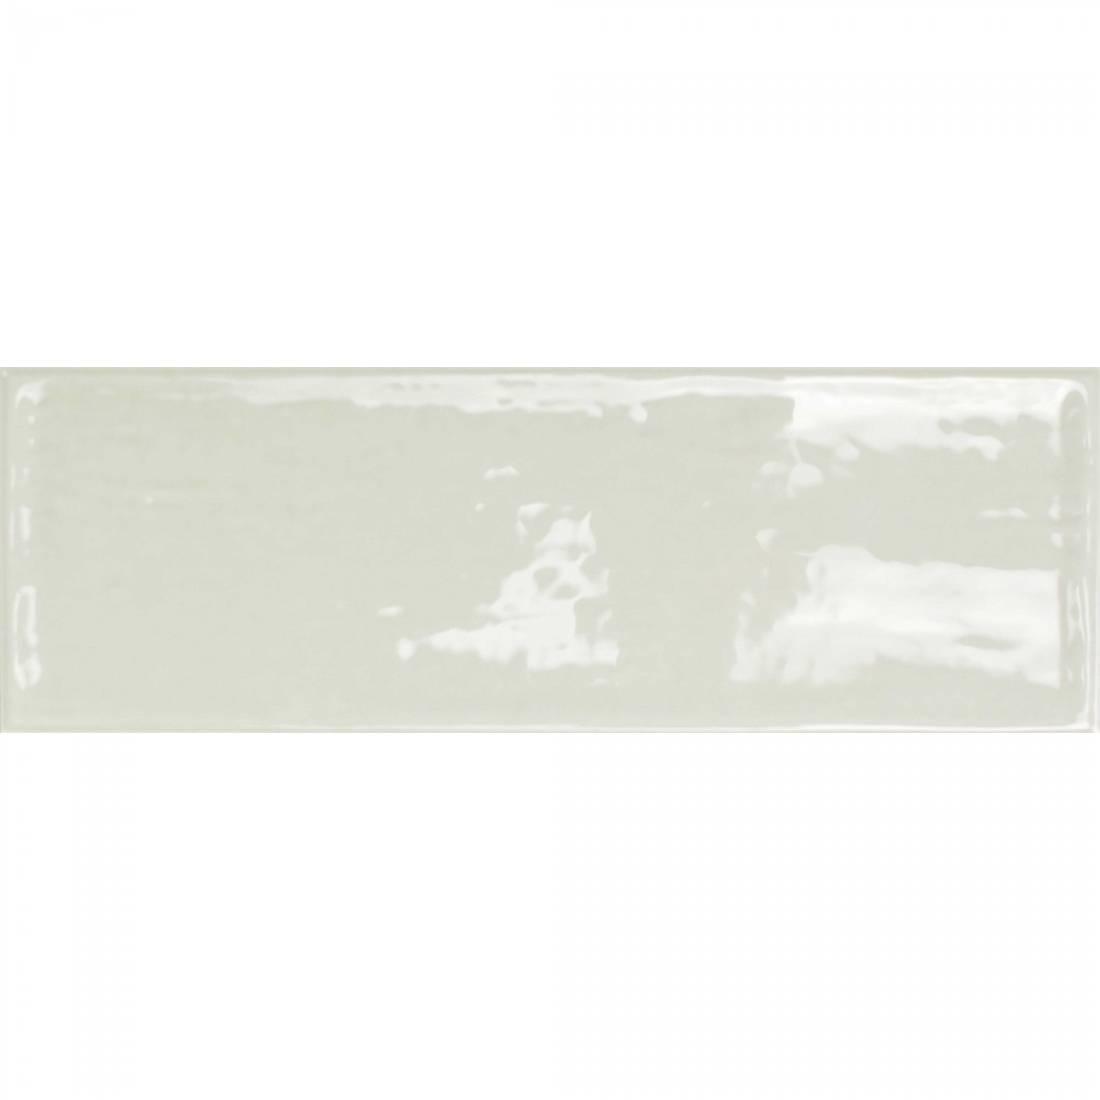 Esencia 10x30 Botella Gloss 1